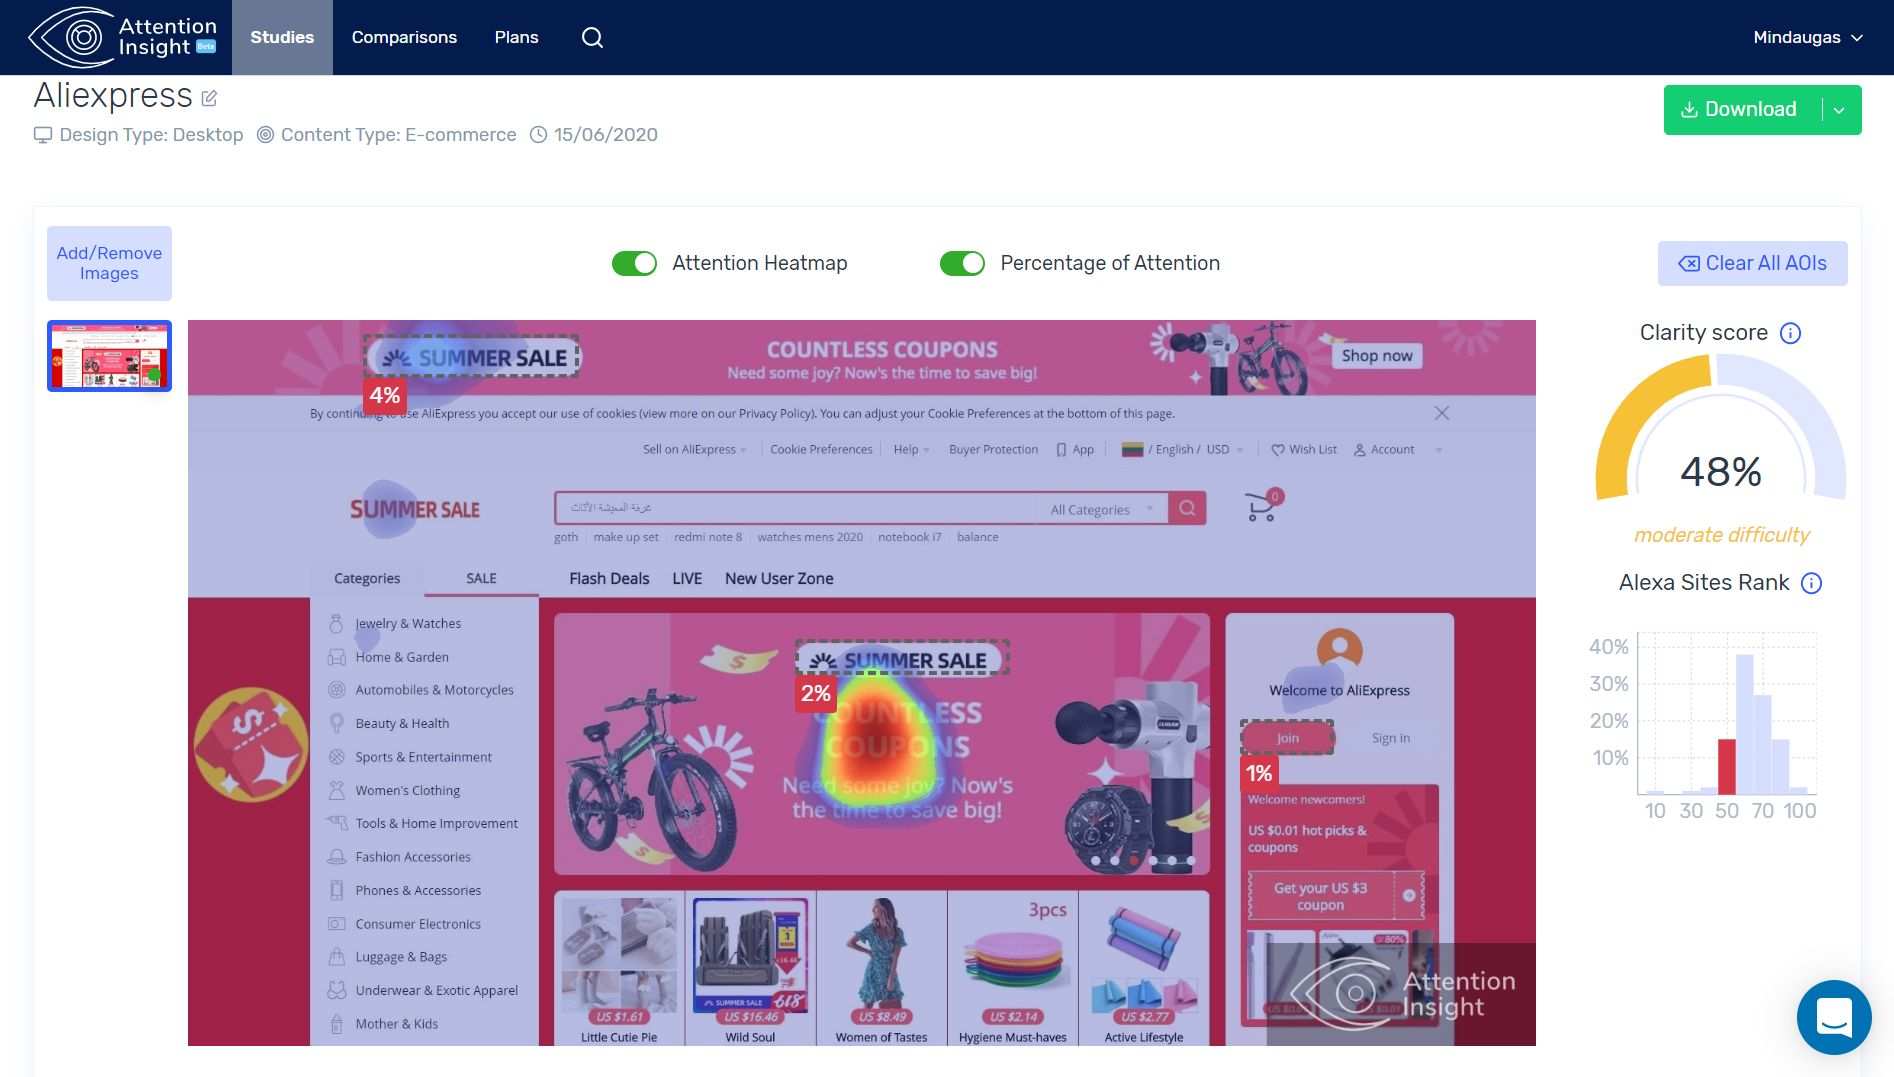 Attention Insight Heatmap, moderate clarity score